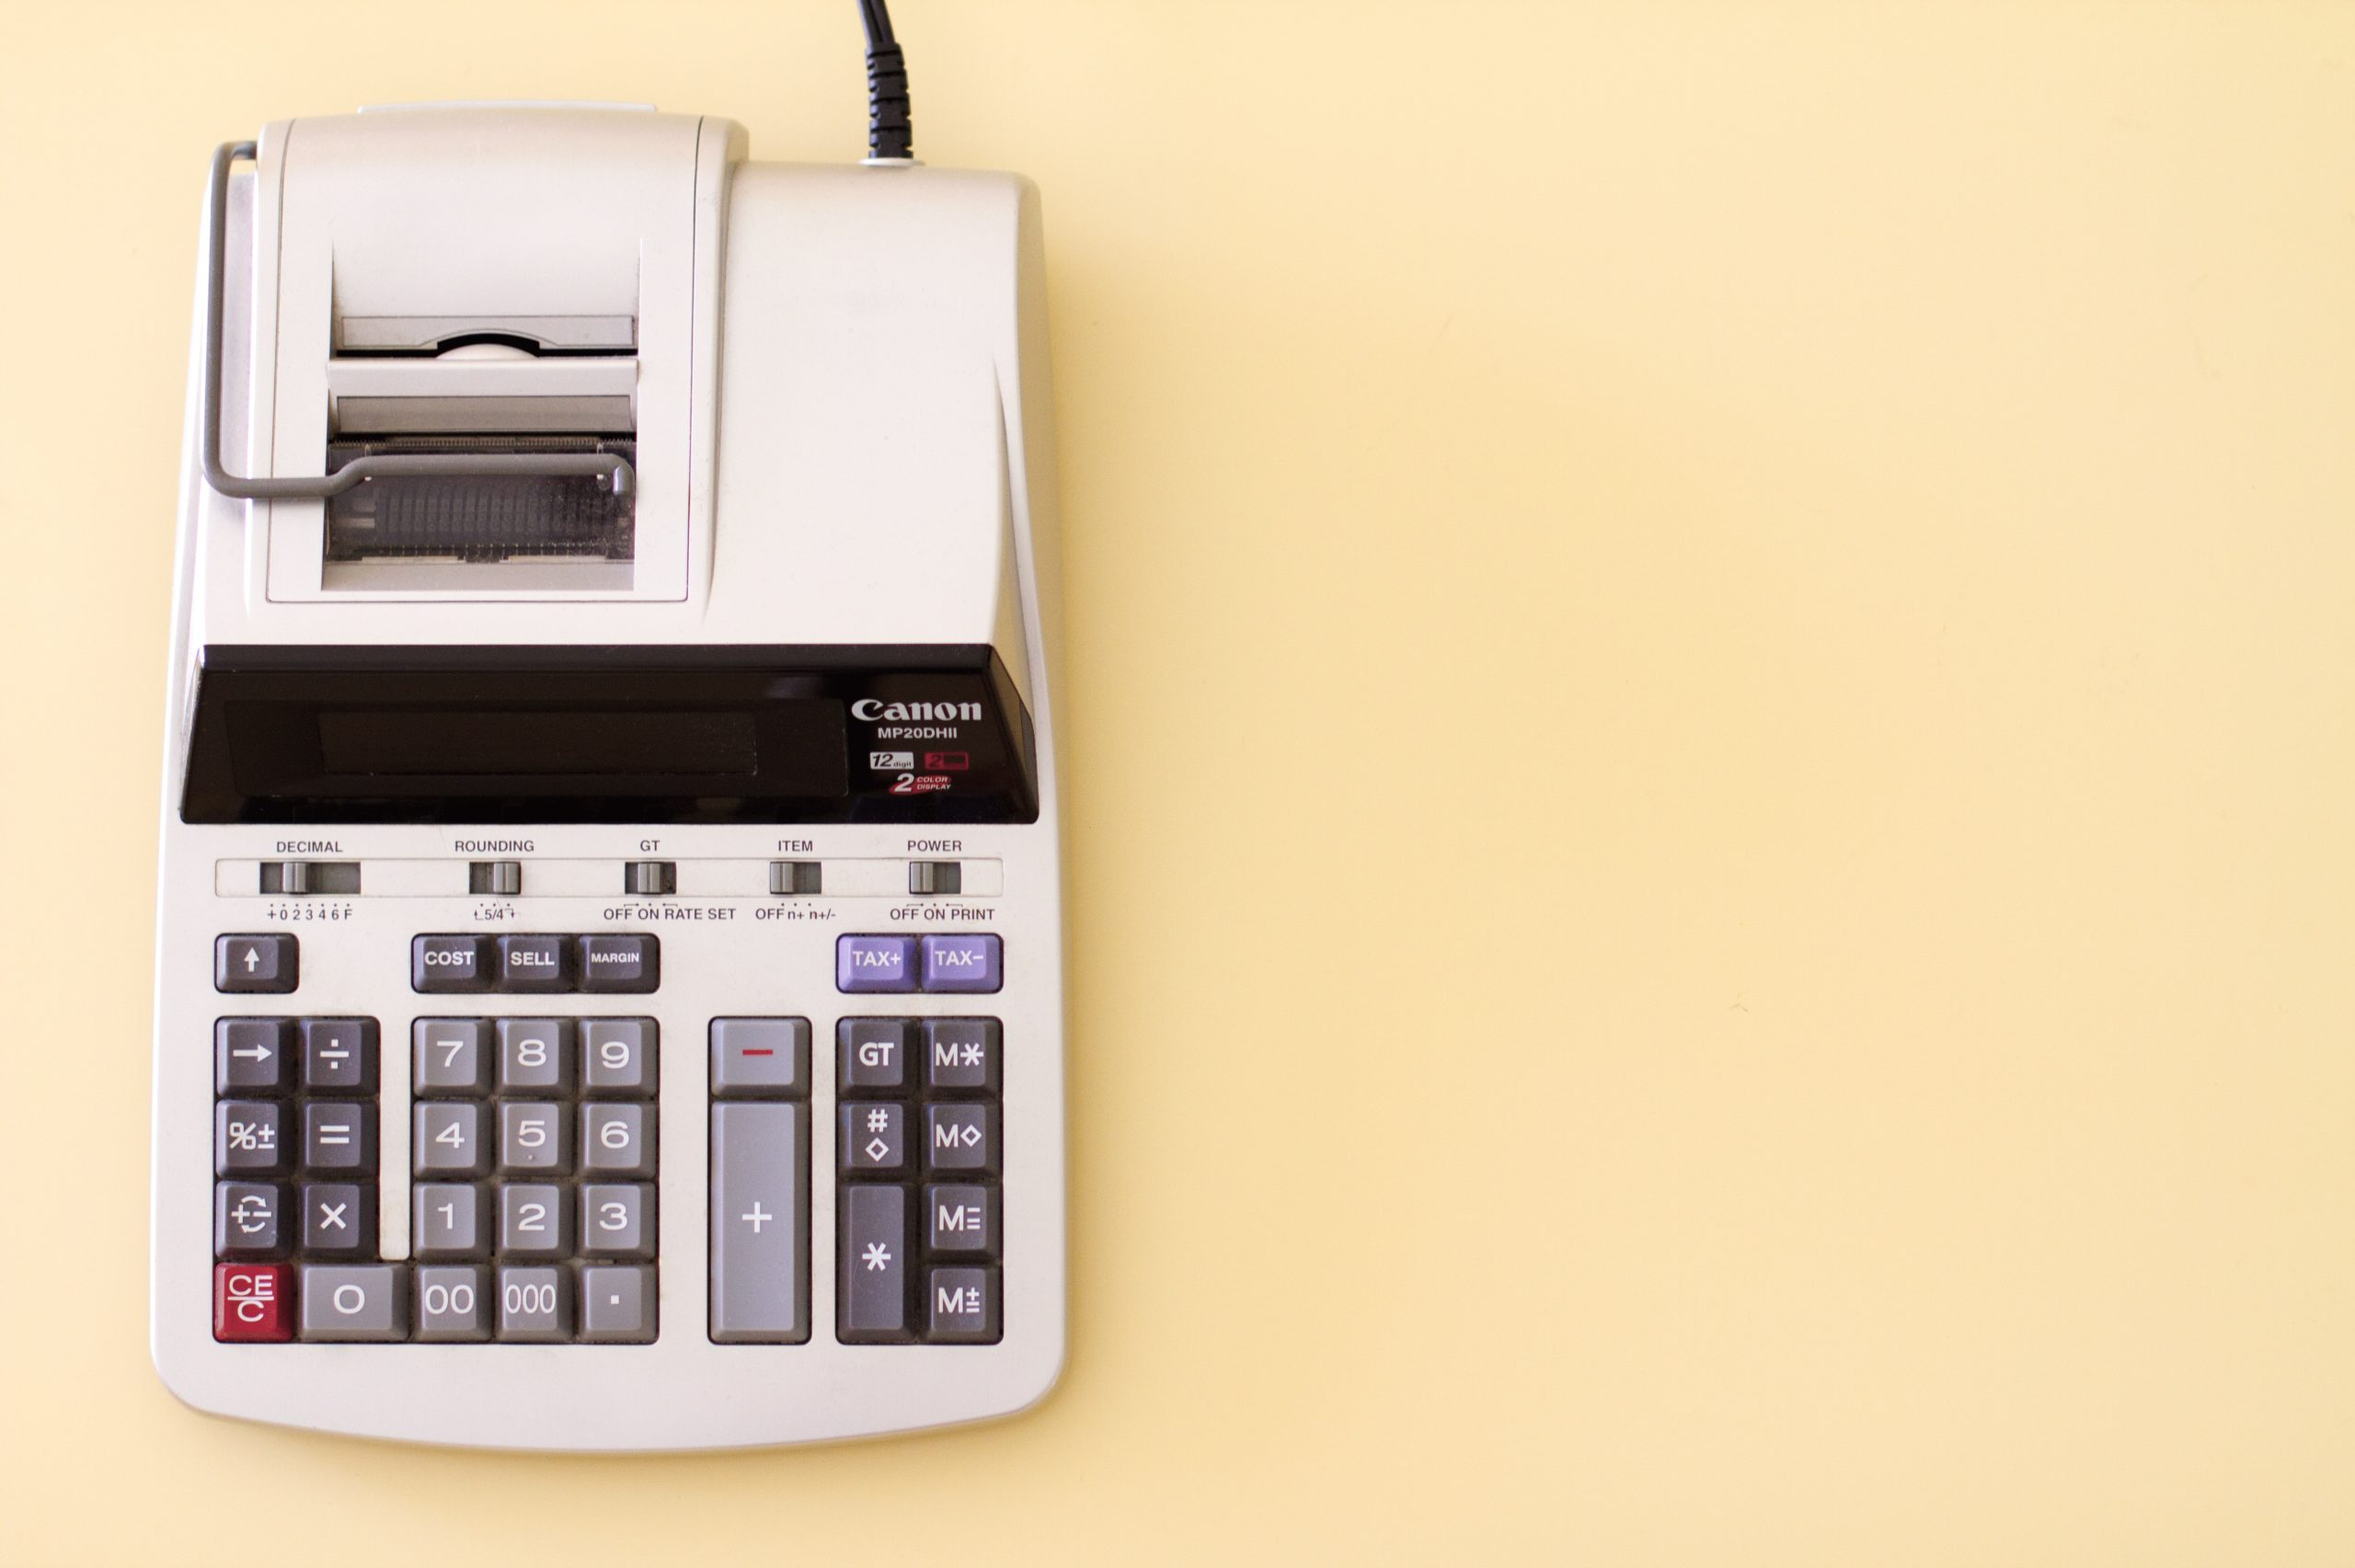 Bank Of Ireland Mortgage Calculator